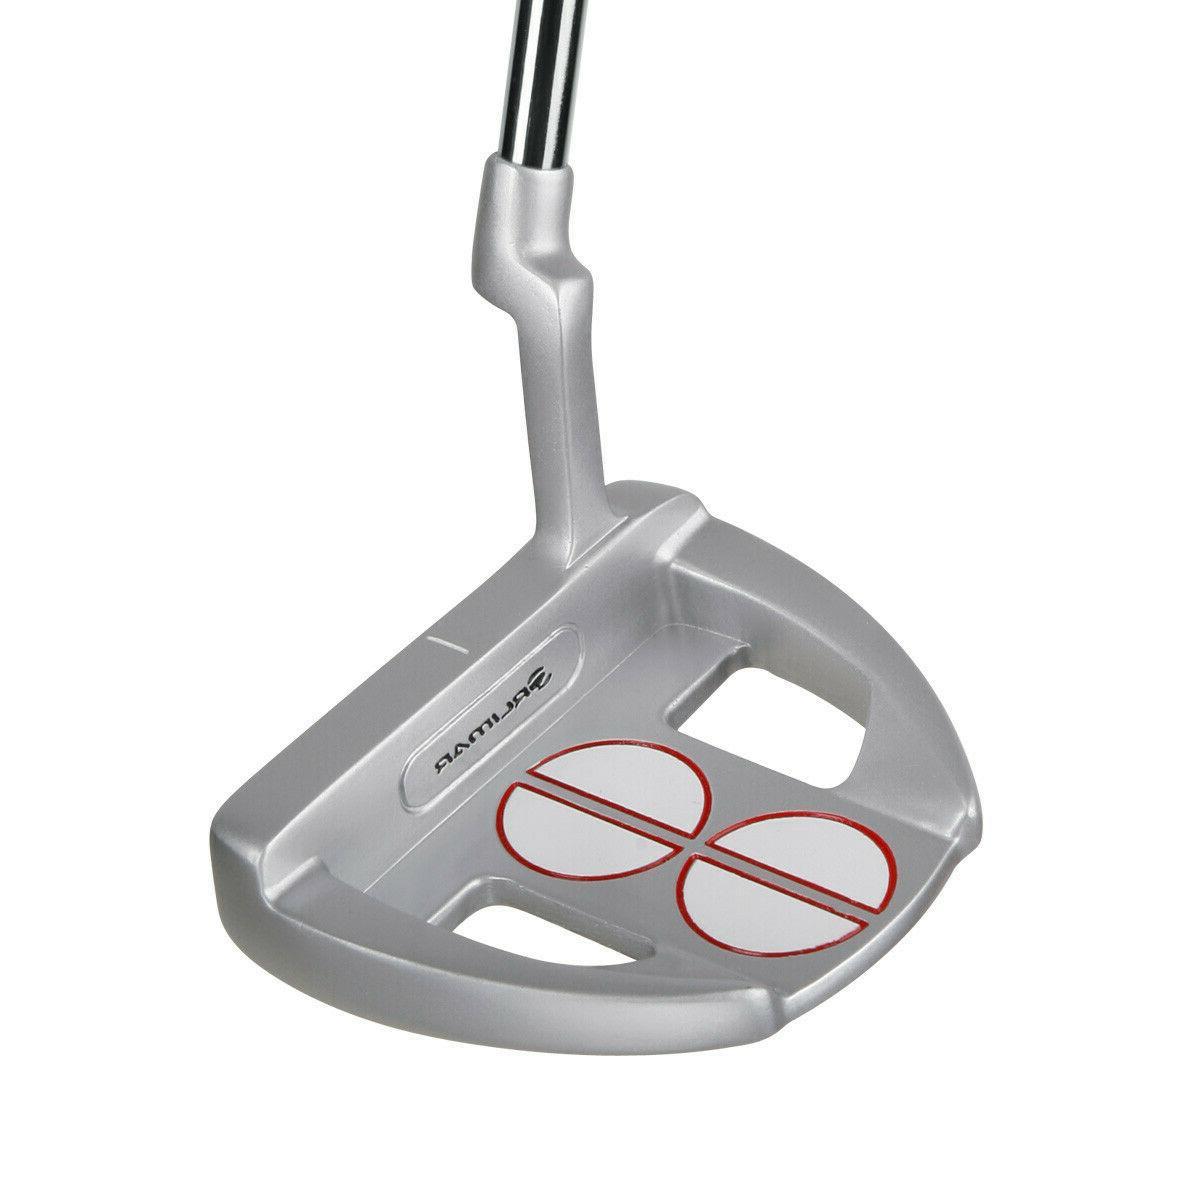 golf f75 mallet putter 33 right handed